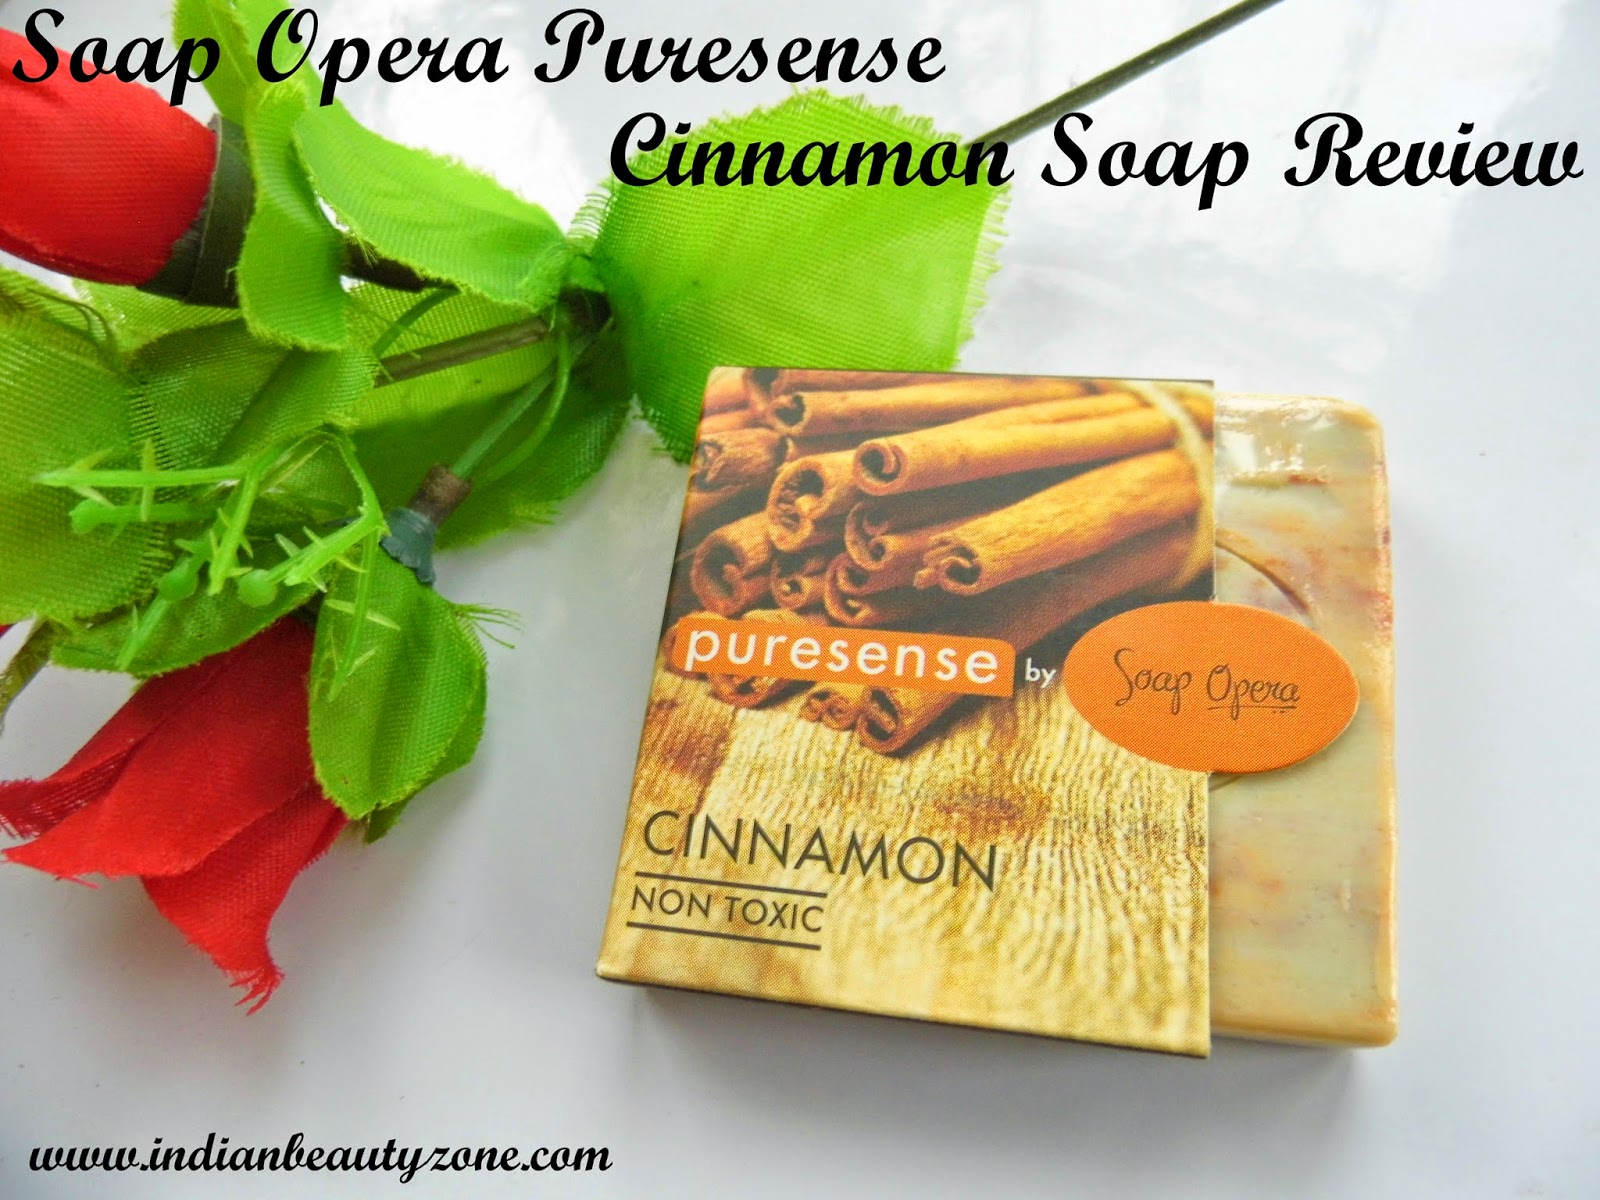 Cinnamon soaps